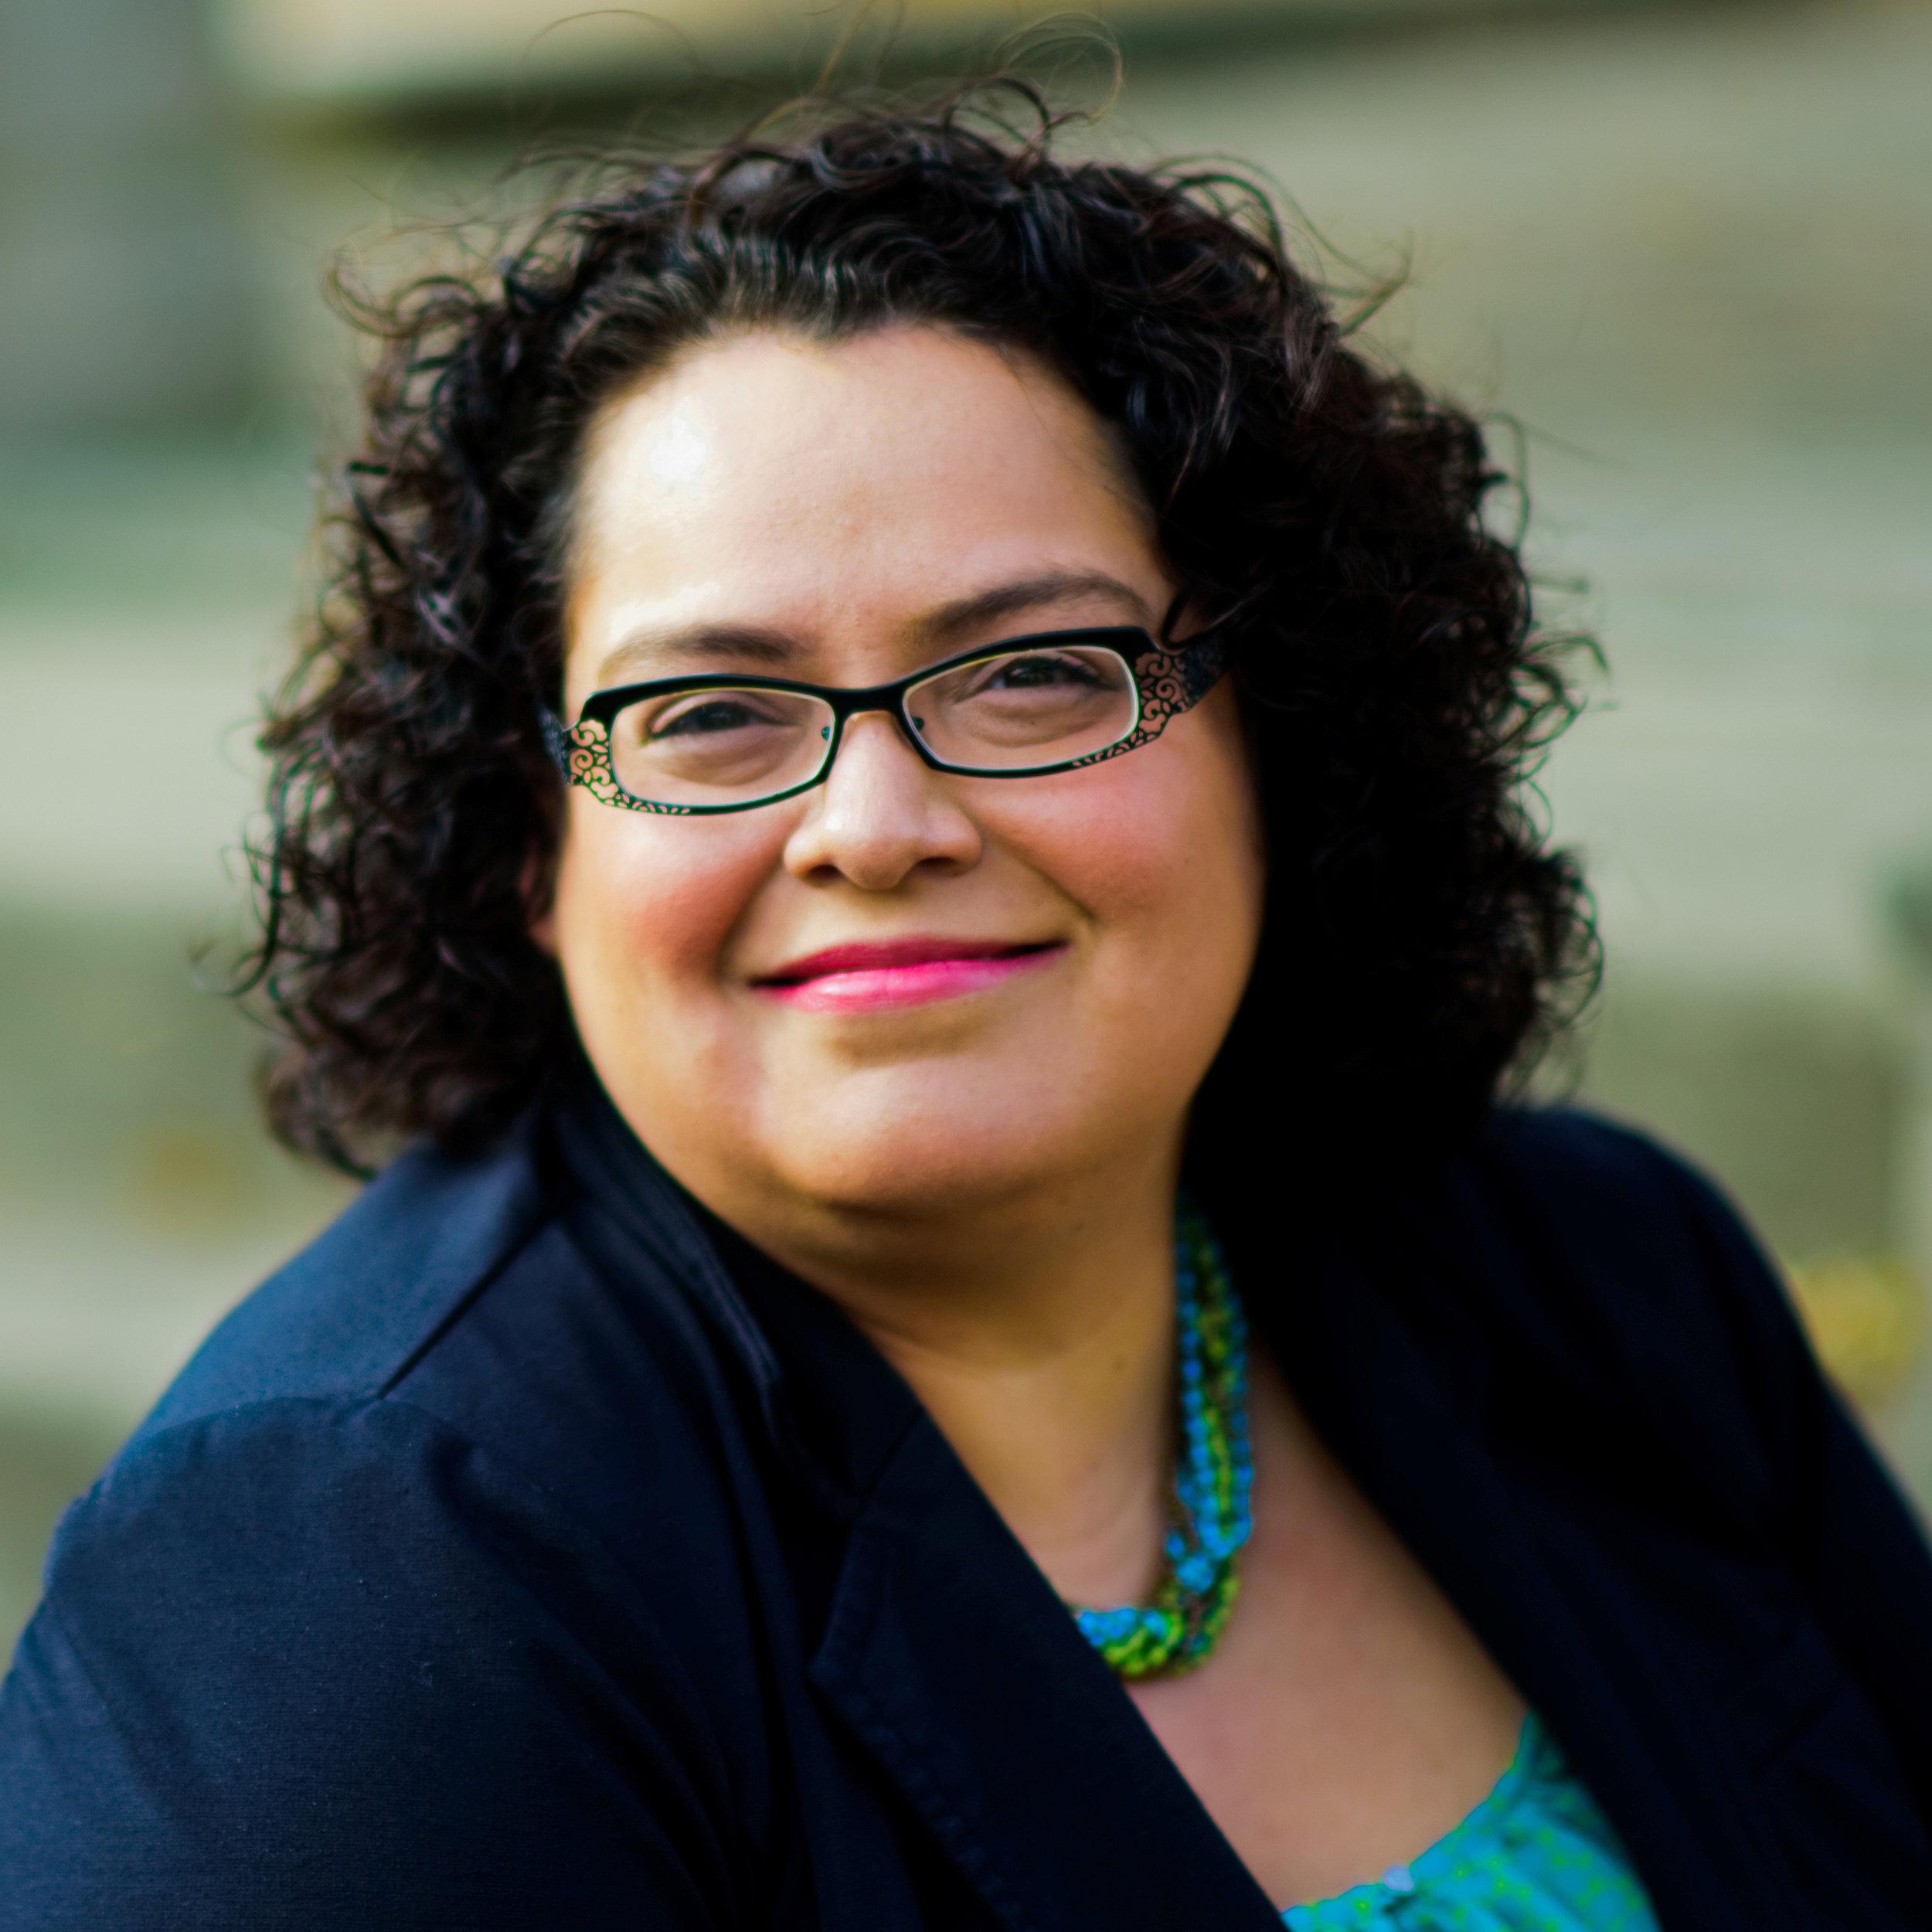 Erika Bachner - candidate for 2019 River Forest VILLAGE TRUSTEE